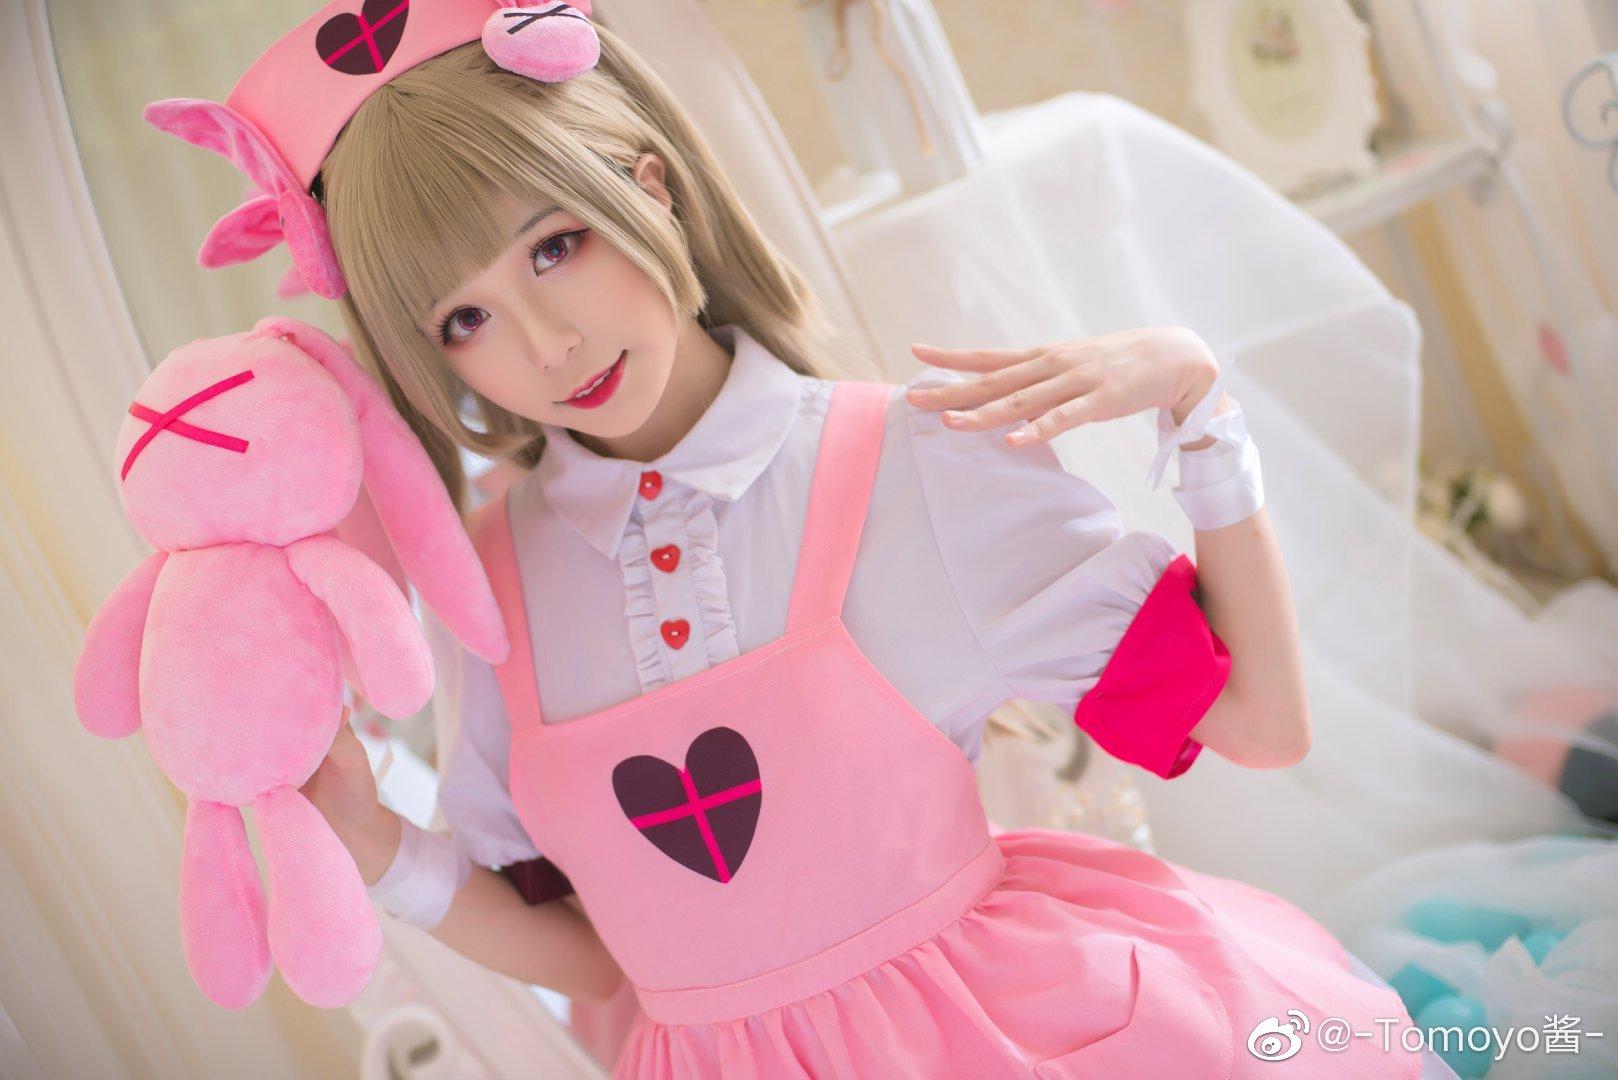 虚拟Youtuber   名取纱那(Natori Sana)   @Tomoyo酱 (9P)-第3张